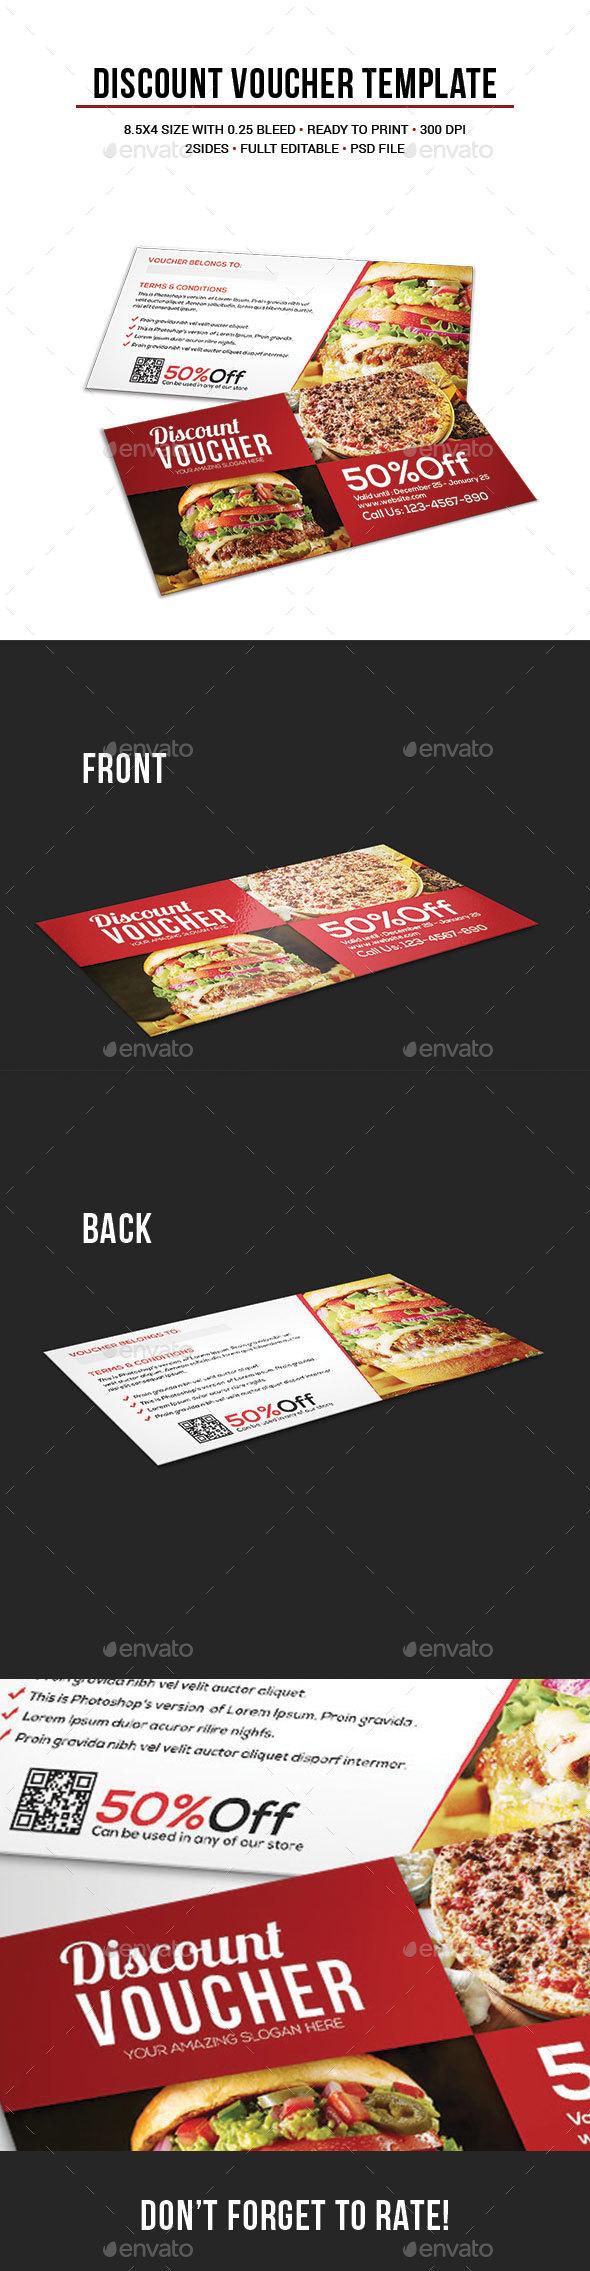 Discount Voucher Template - Cards & Invites Print Templates